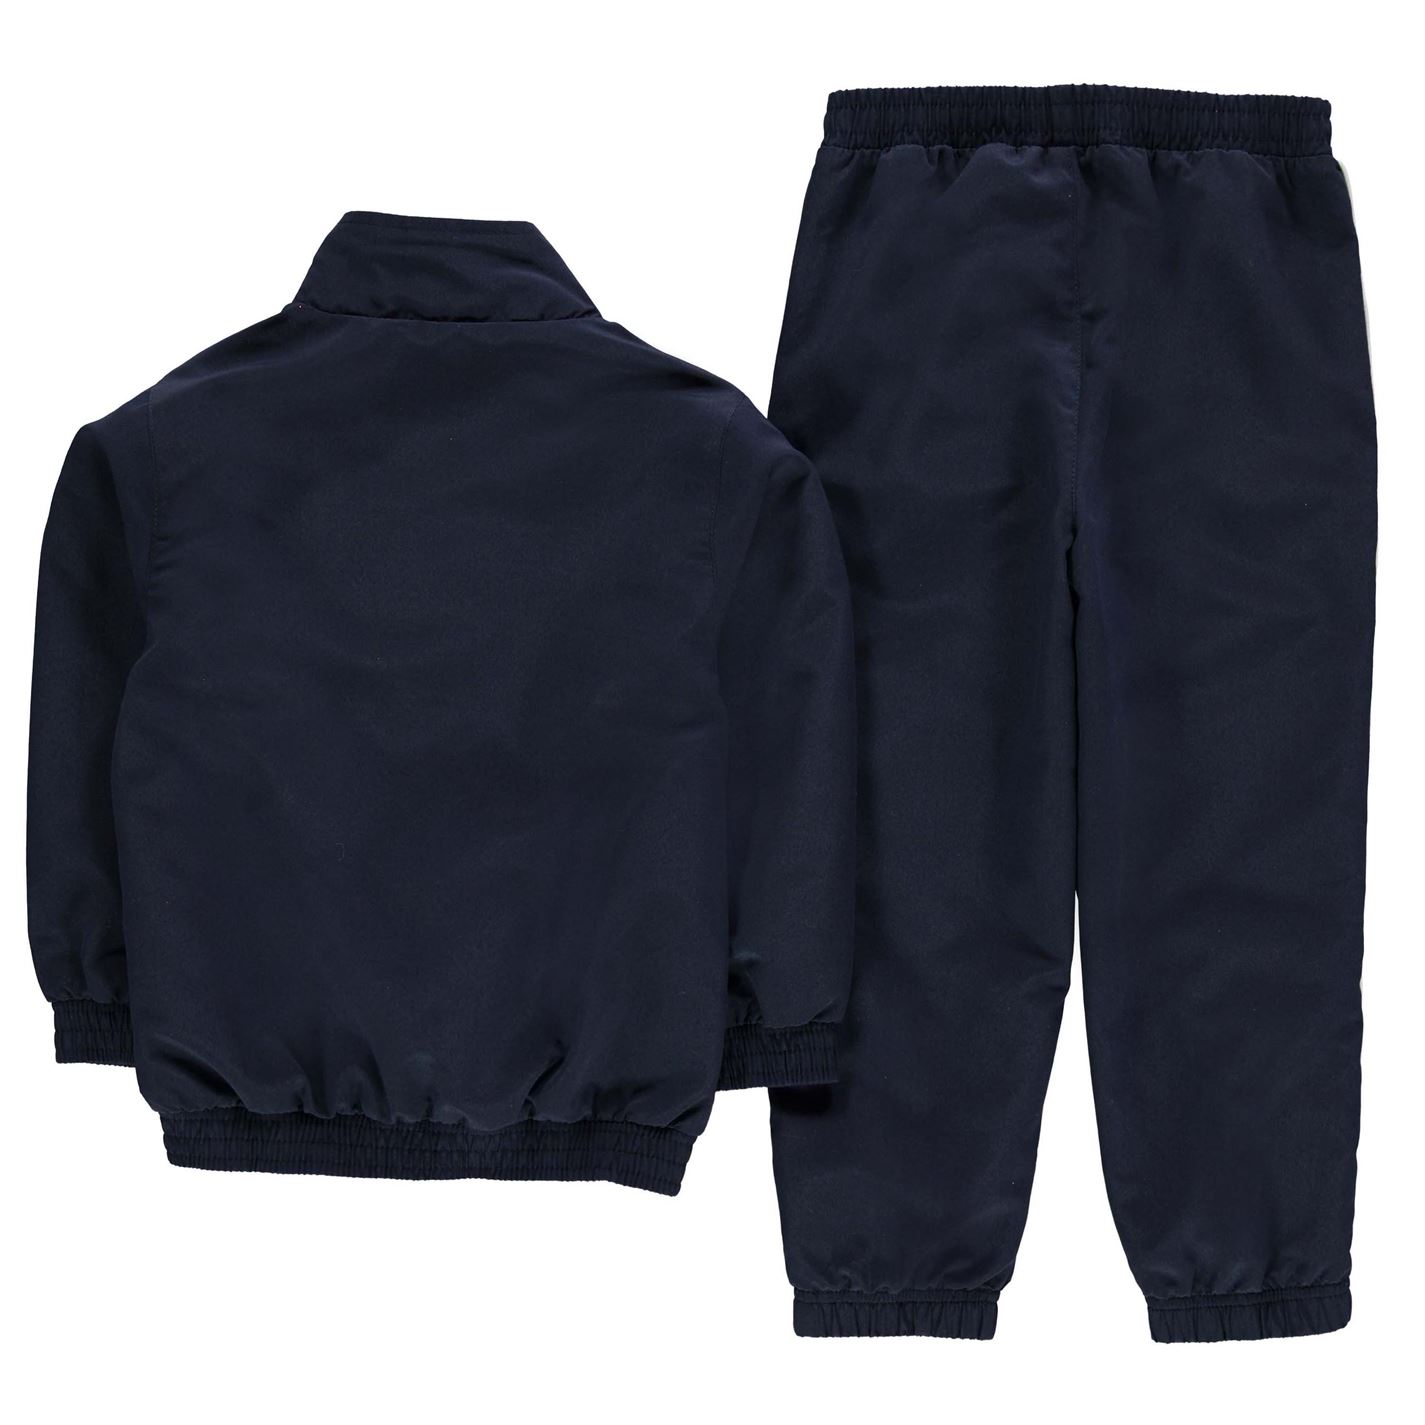 Slazenger Woven Suit Infant Tracksuit Zip Top and Bottoms Kids Boys Children